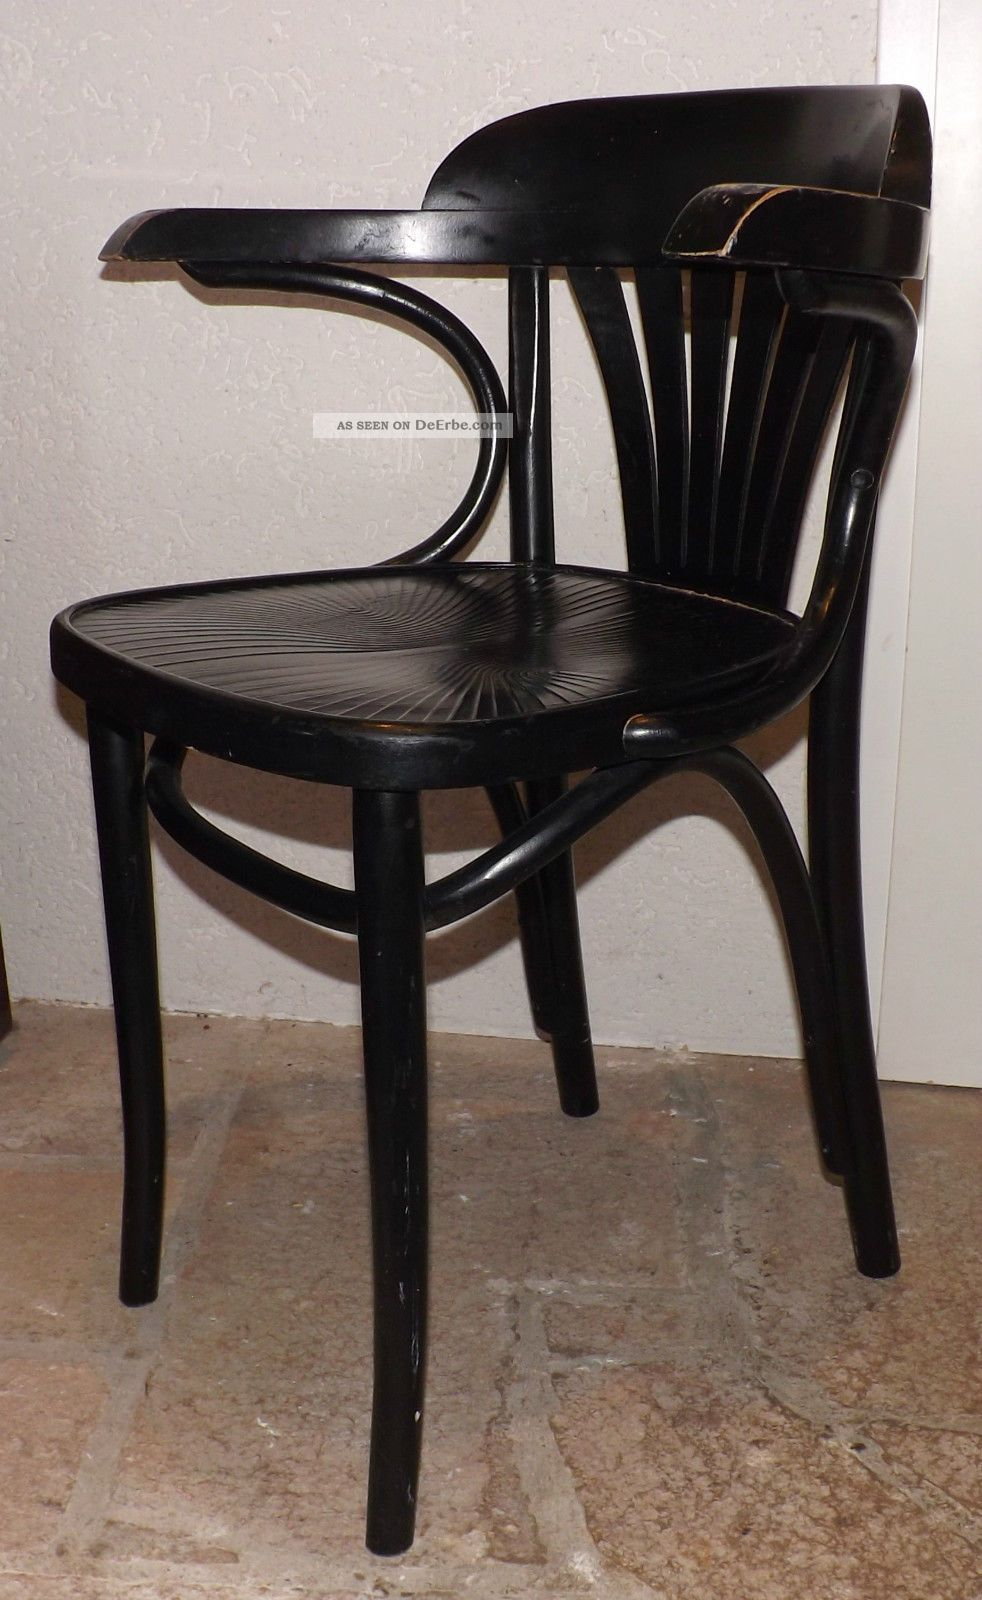 kaffeehausstuhl armlehnstuhl schwarz bugholz radomsko thonet art deco 1 v 2. Black Bedroom Furniture Sets. Home Design Ideas